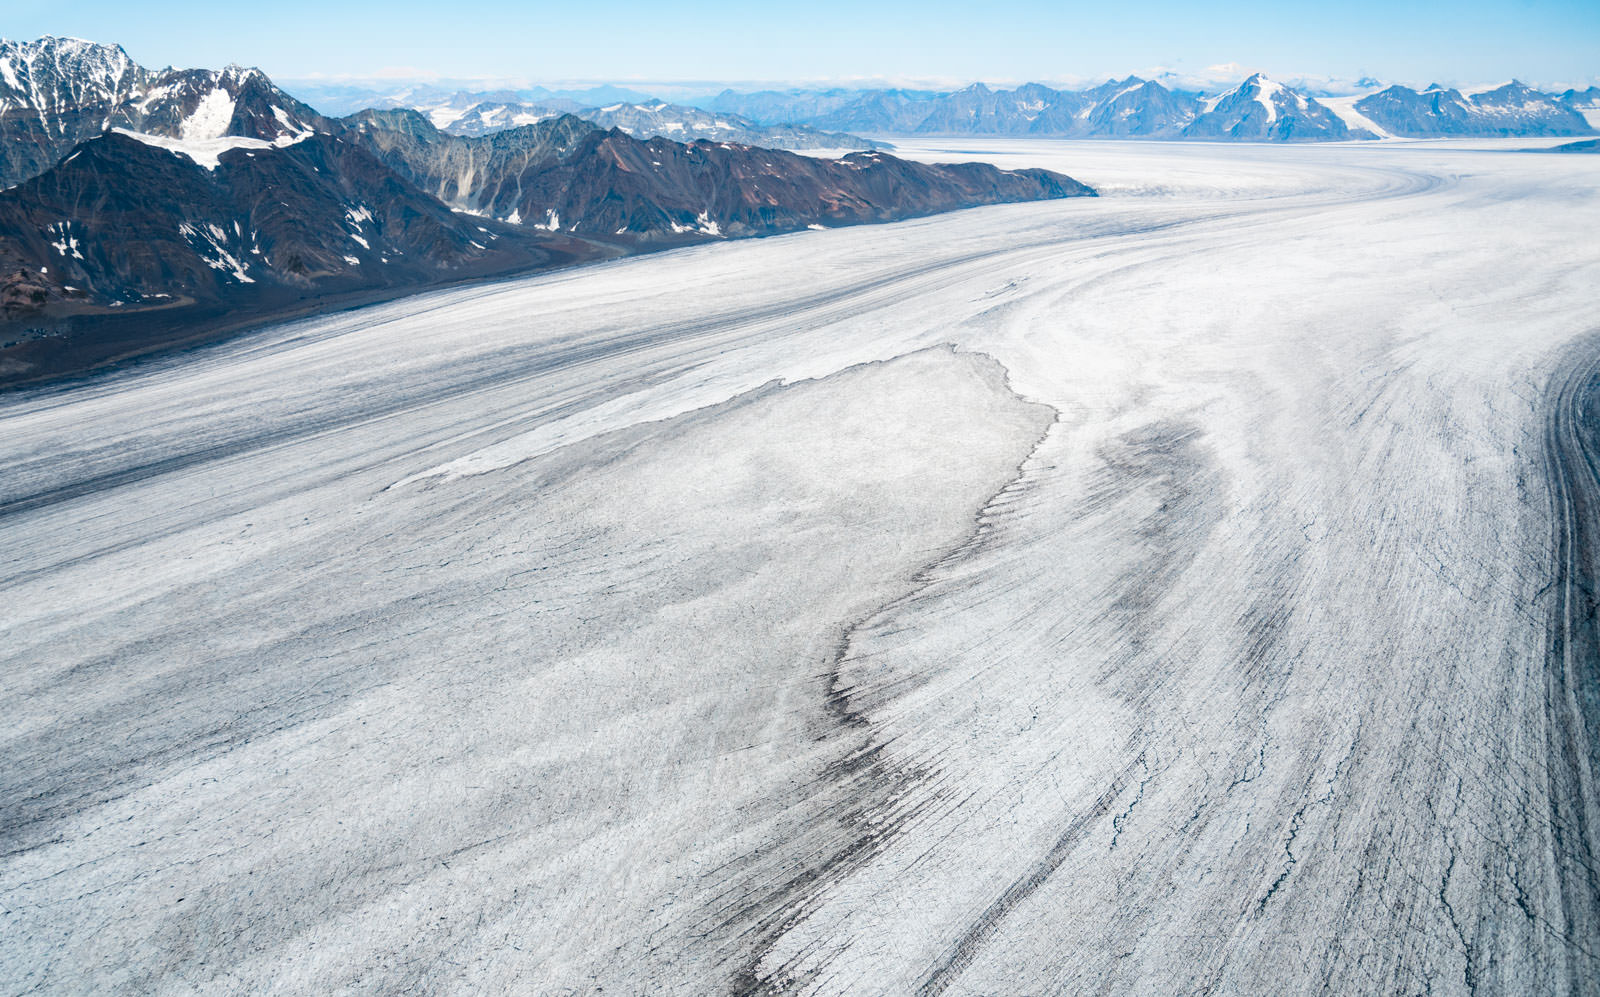 Bagley Icefield - University Range Tour: Bering Glacier